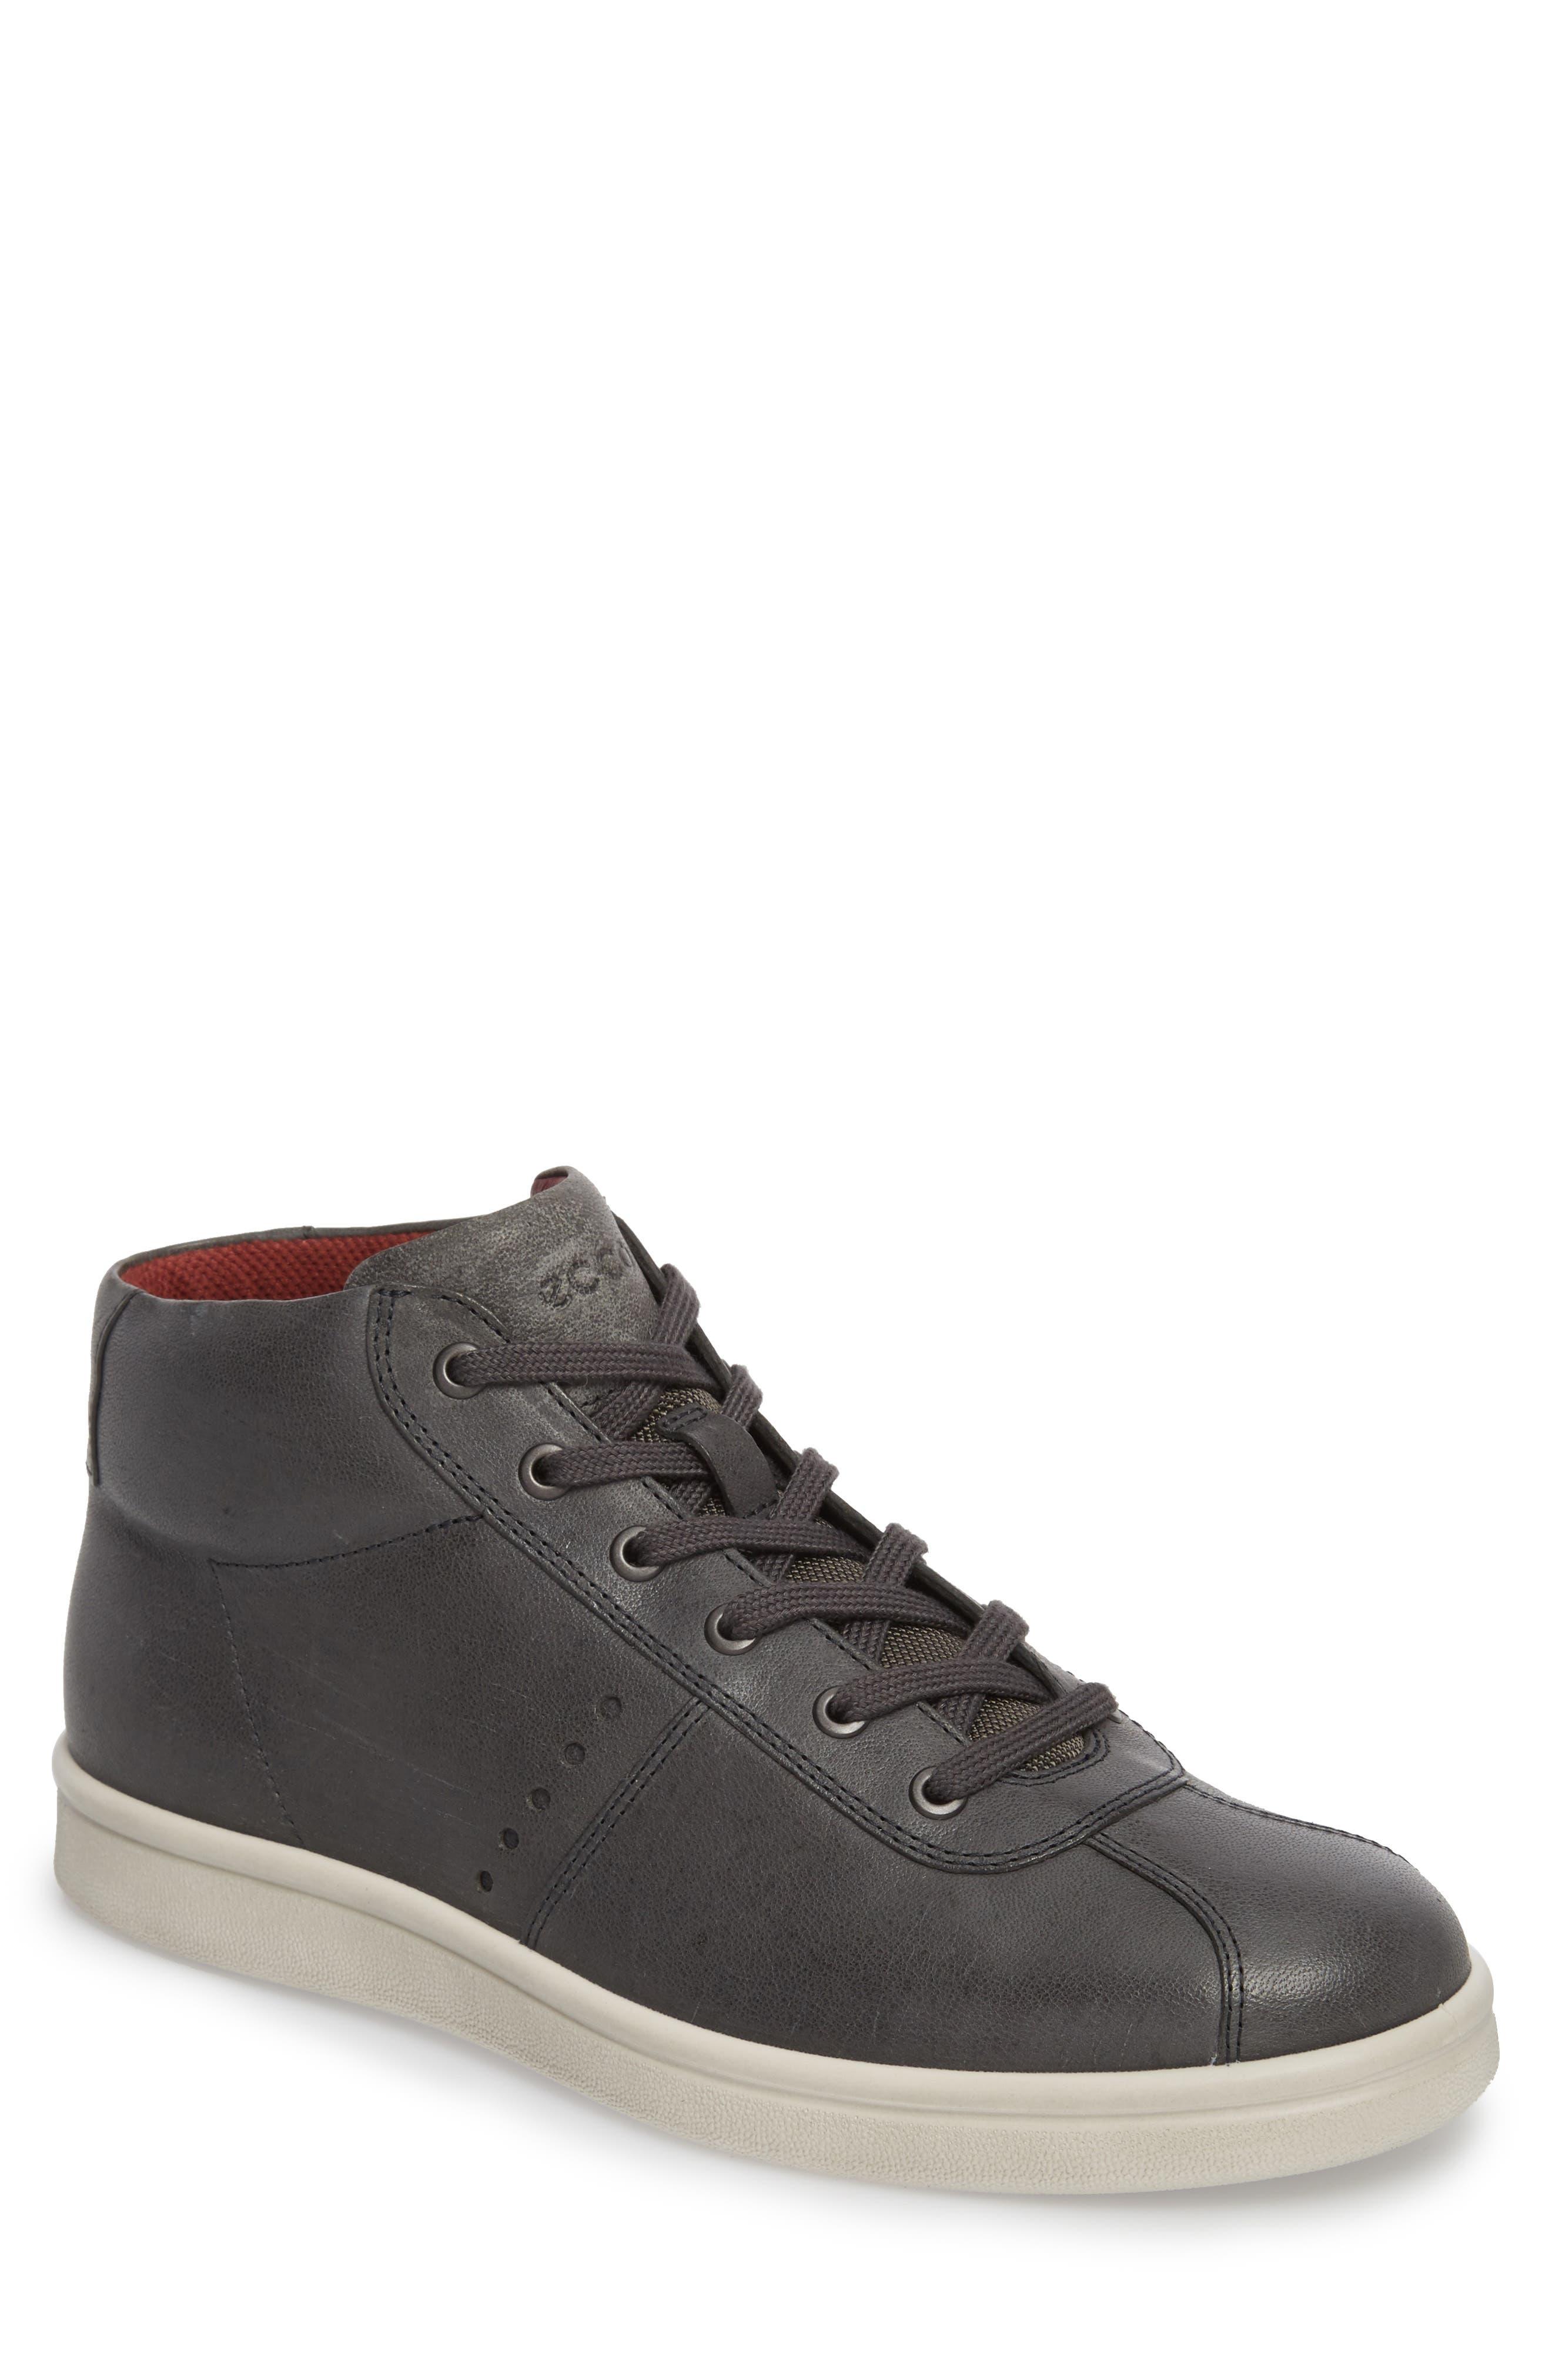 Kallum High Top Sneaker,                             Main thumbnail 1, color,                             078